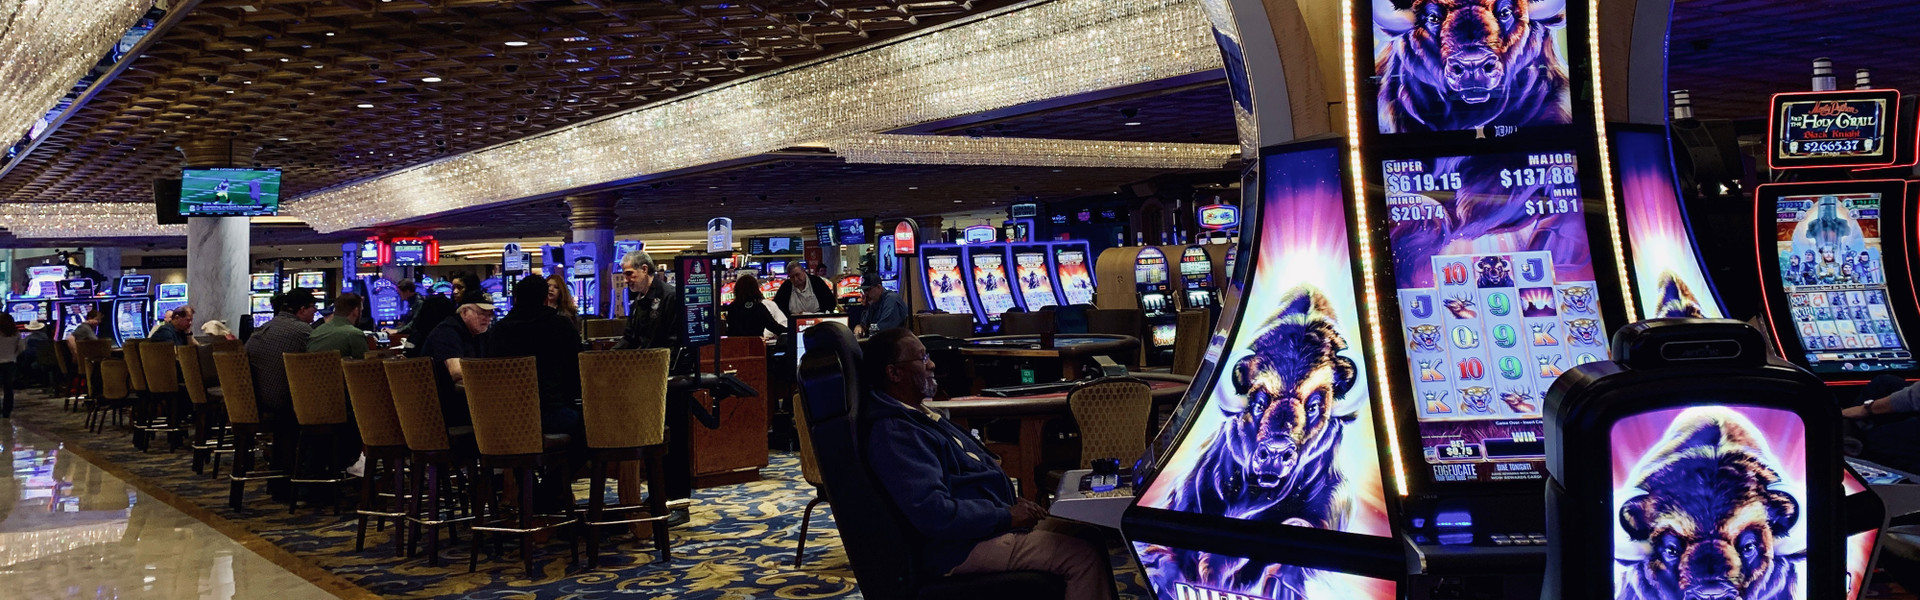 Win Big at the Sir Winston Tailgate $40,000 Slot Tournament January 24-26, 2020 at the Westgate Las Vegas Resort & Casino